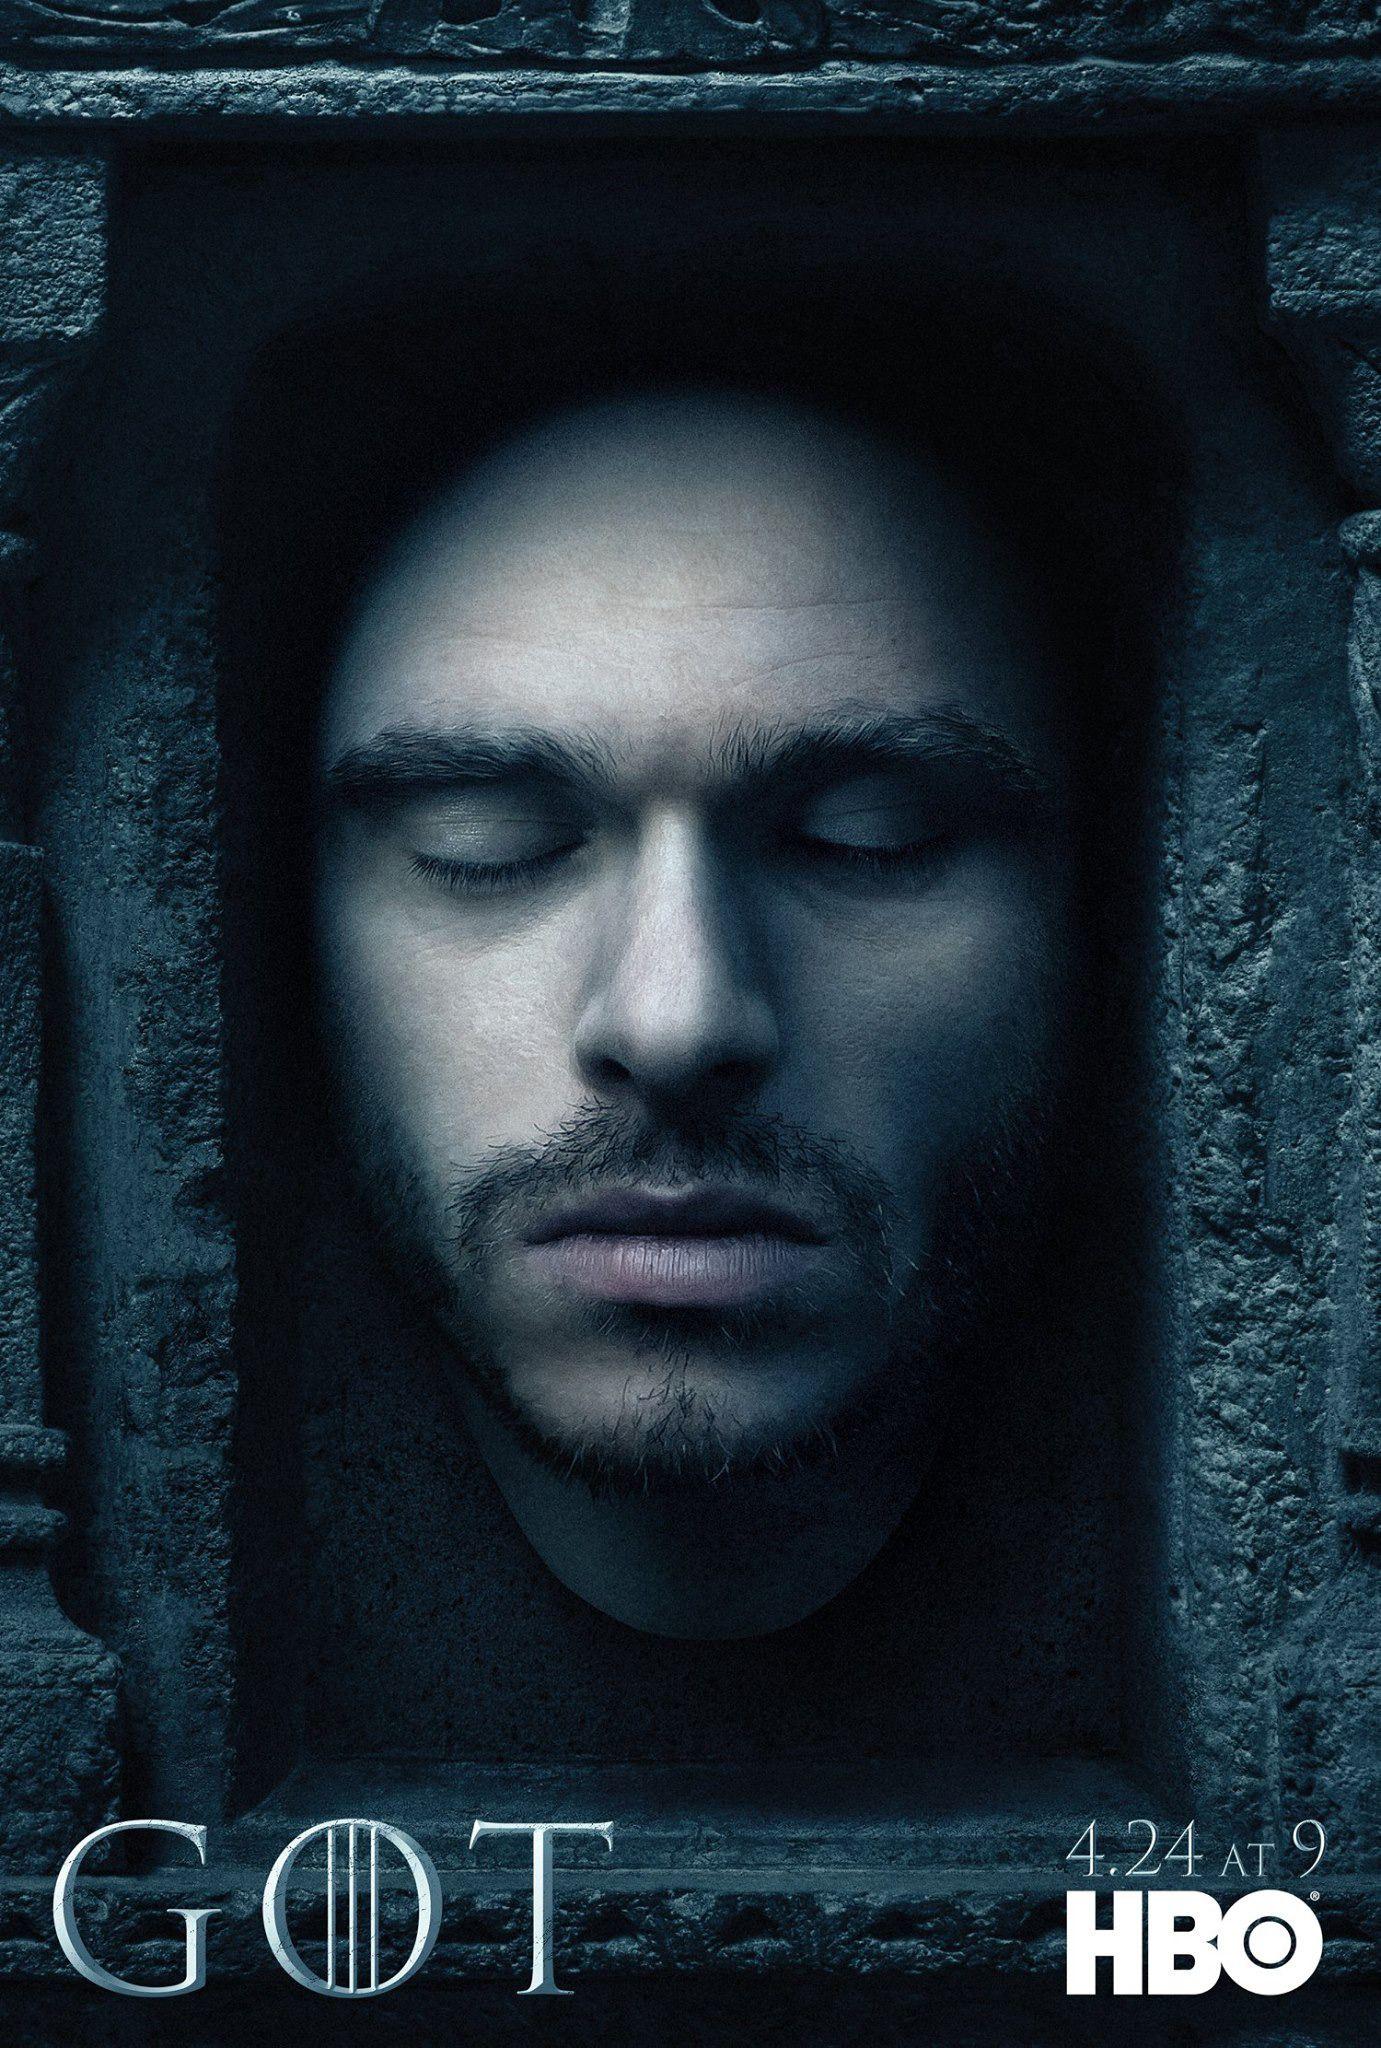 Season 6 Robb Stark Game Of Thrones Poster Seasons